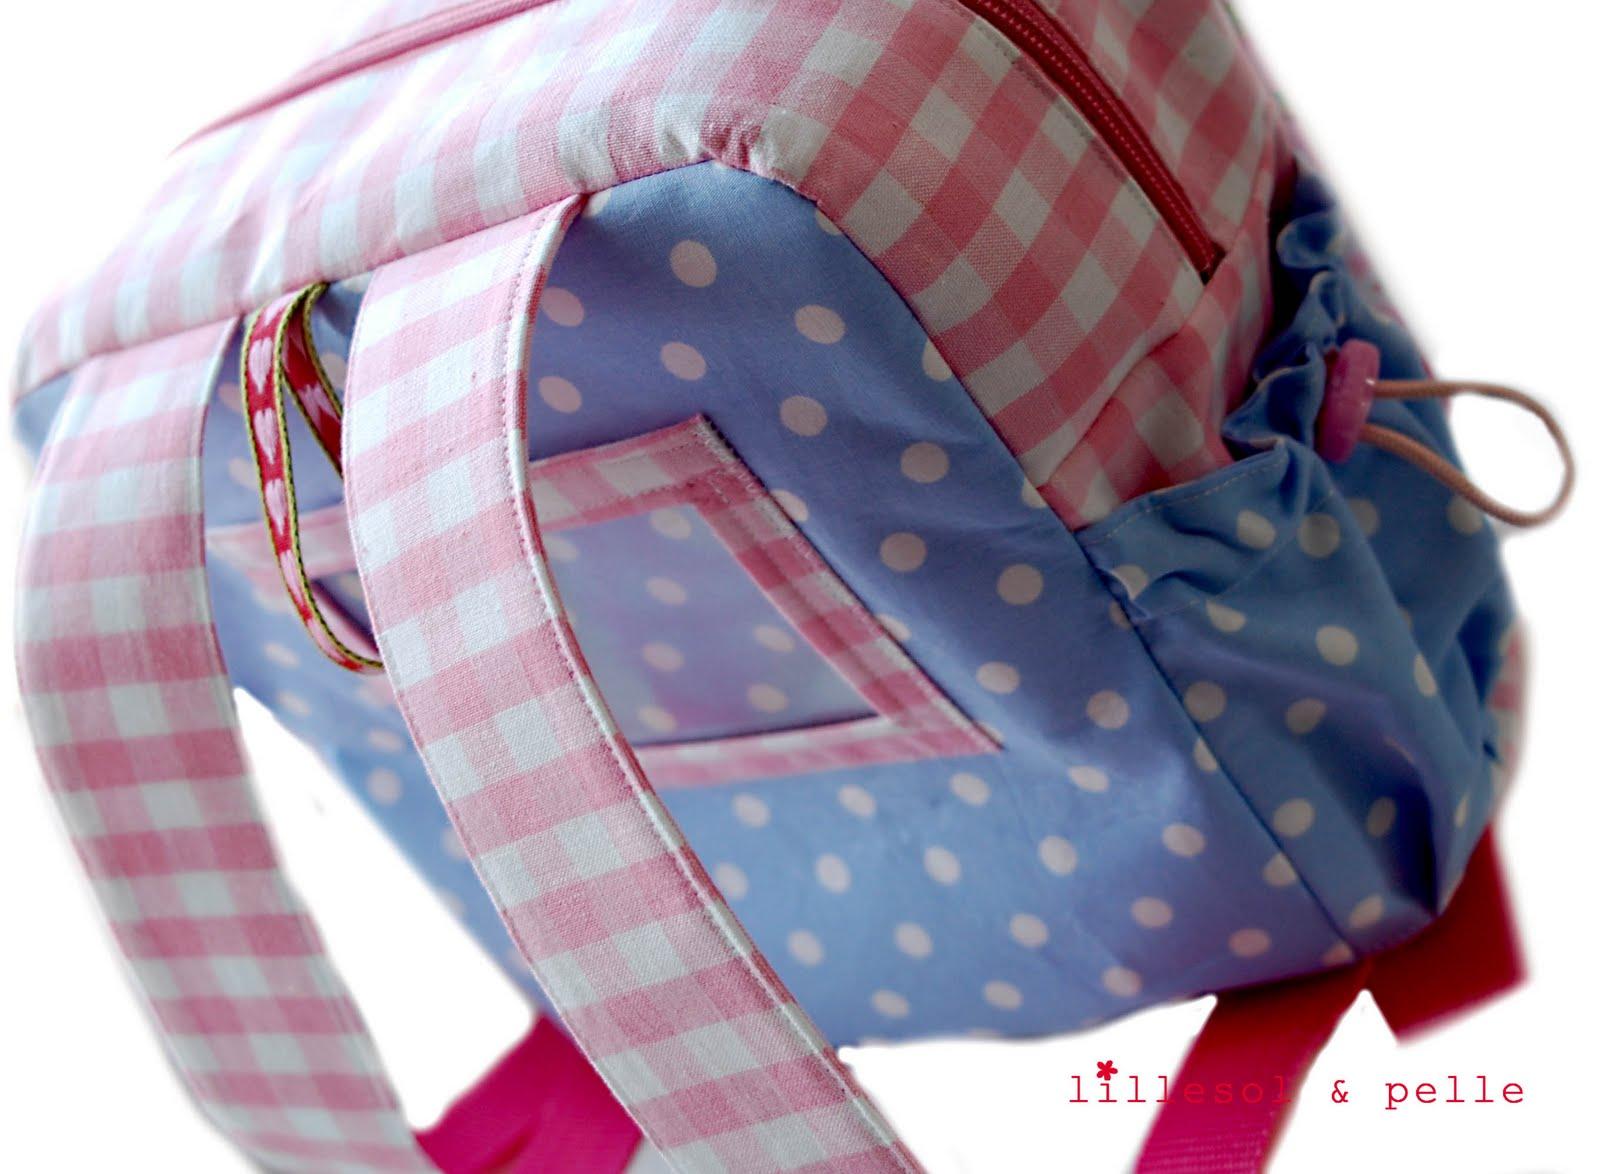 Neues Ebook: Kindergarten-Rucksack Rudi! | lillesol & pelle ...